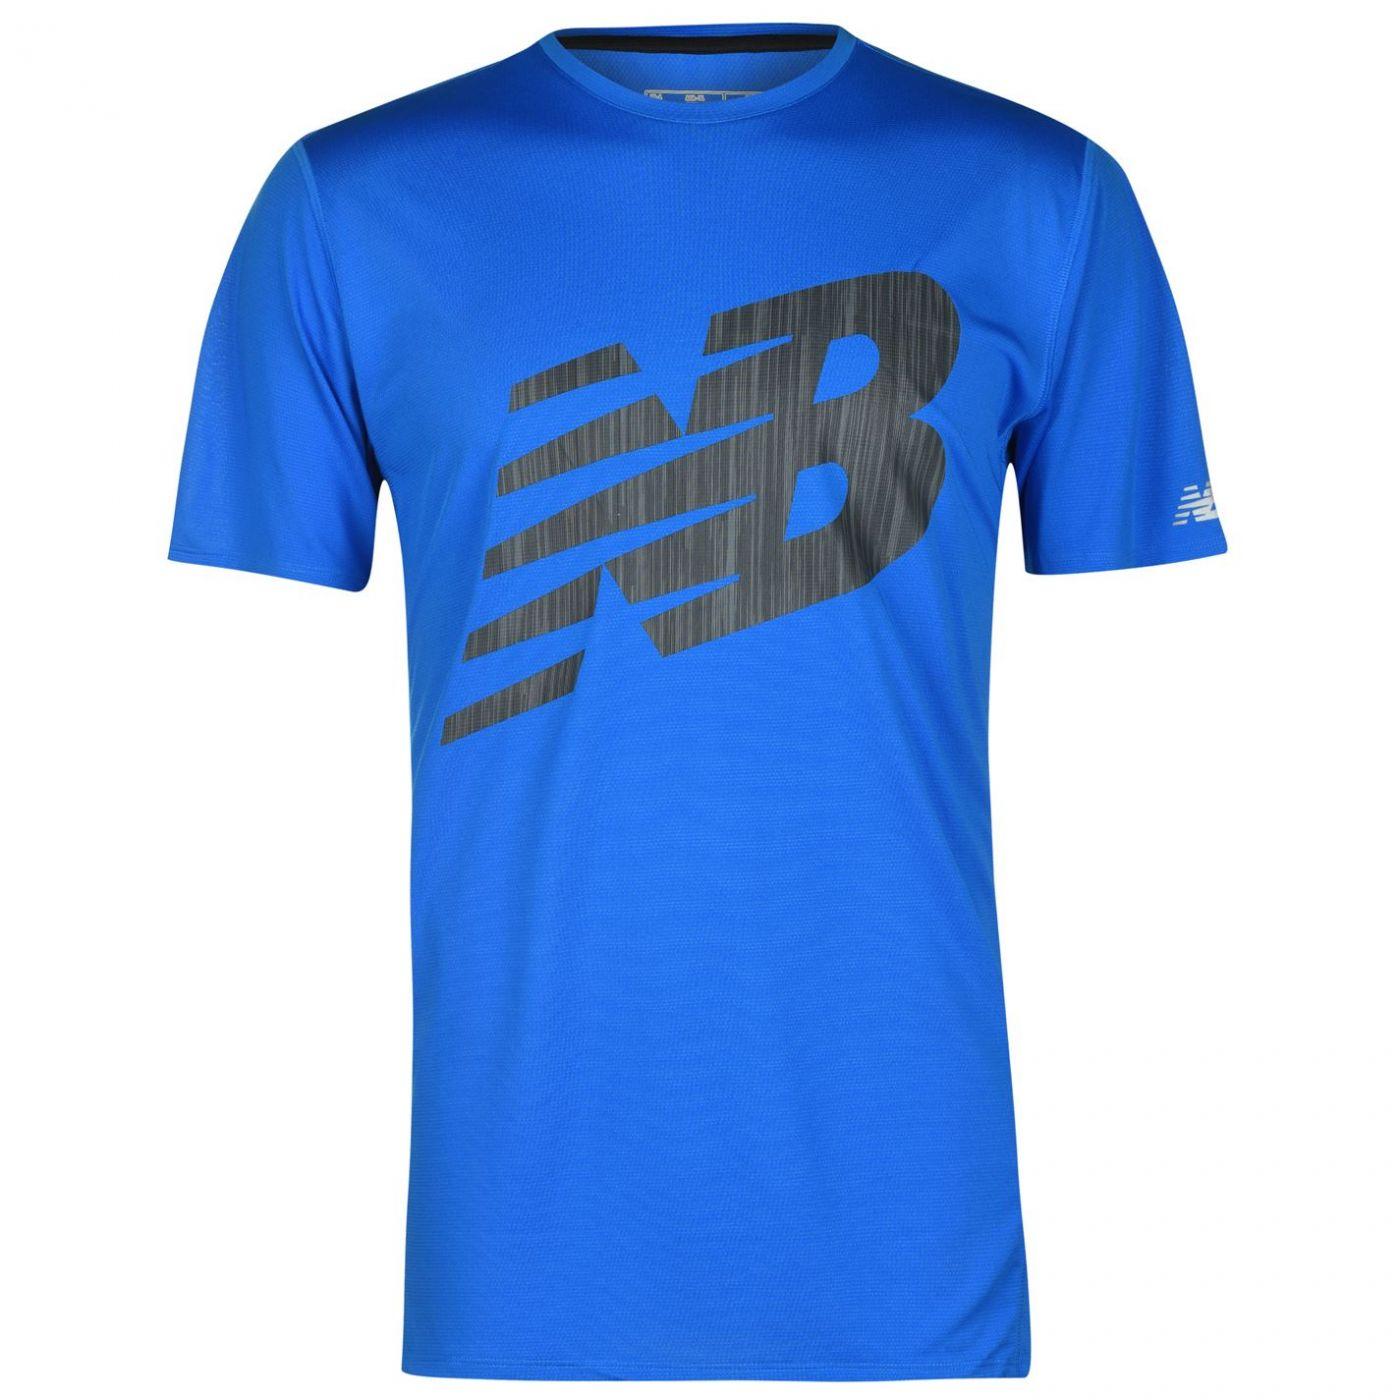 New Balance Short Sleeve T Shirt Mens